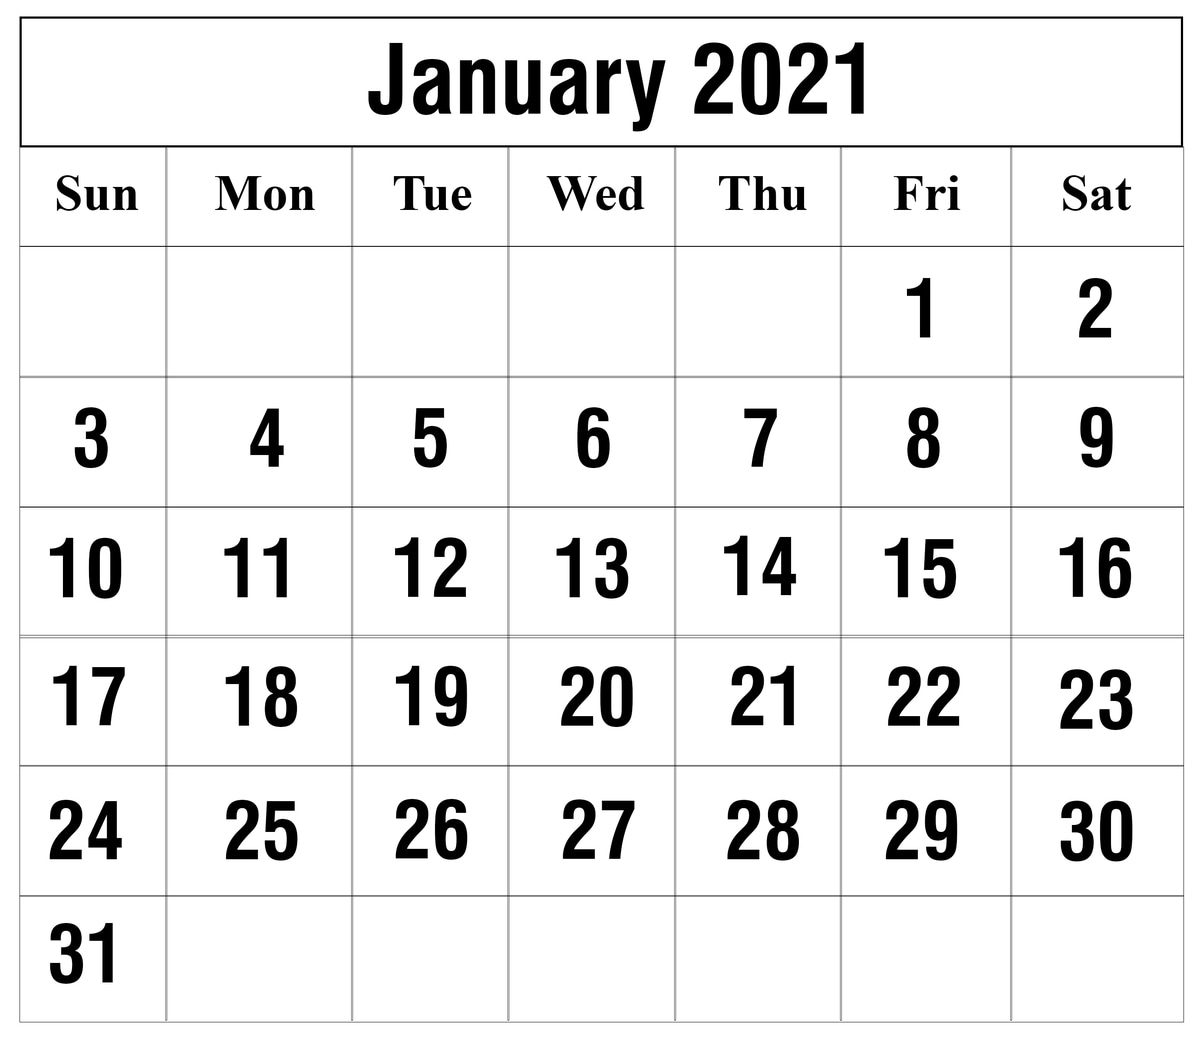 Excel Calendar January 2021 2021 Excel Calendar